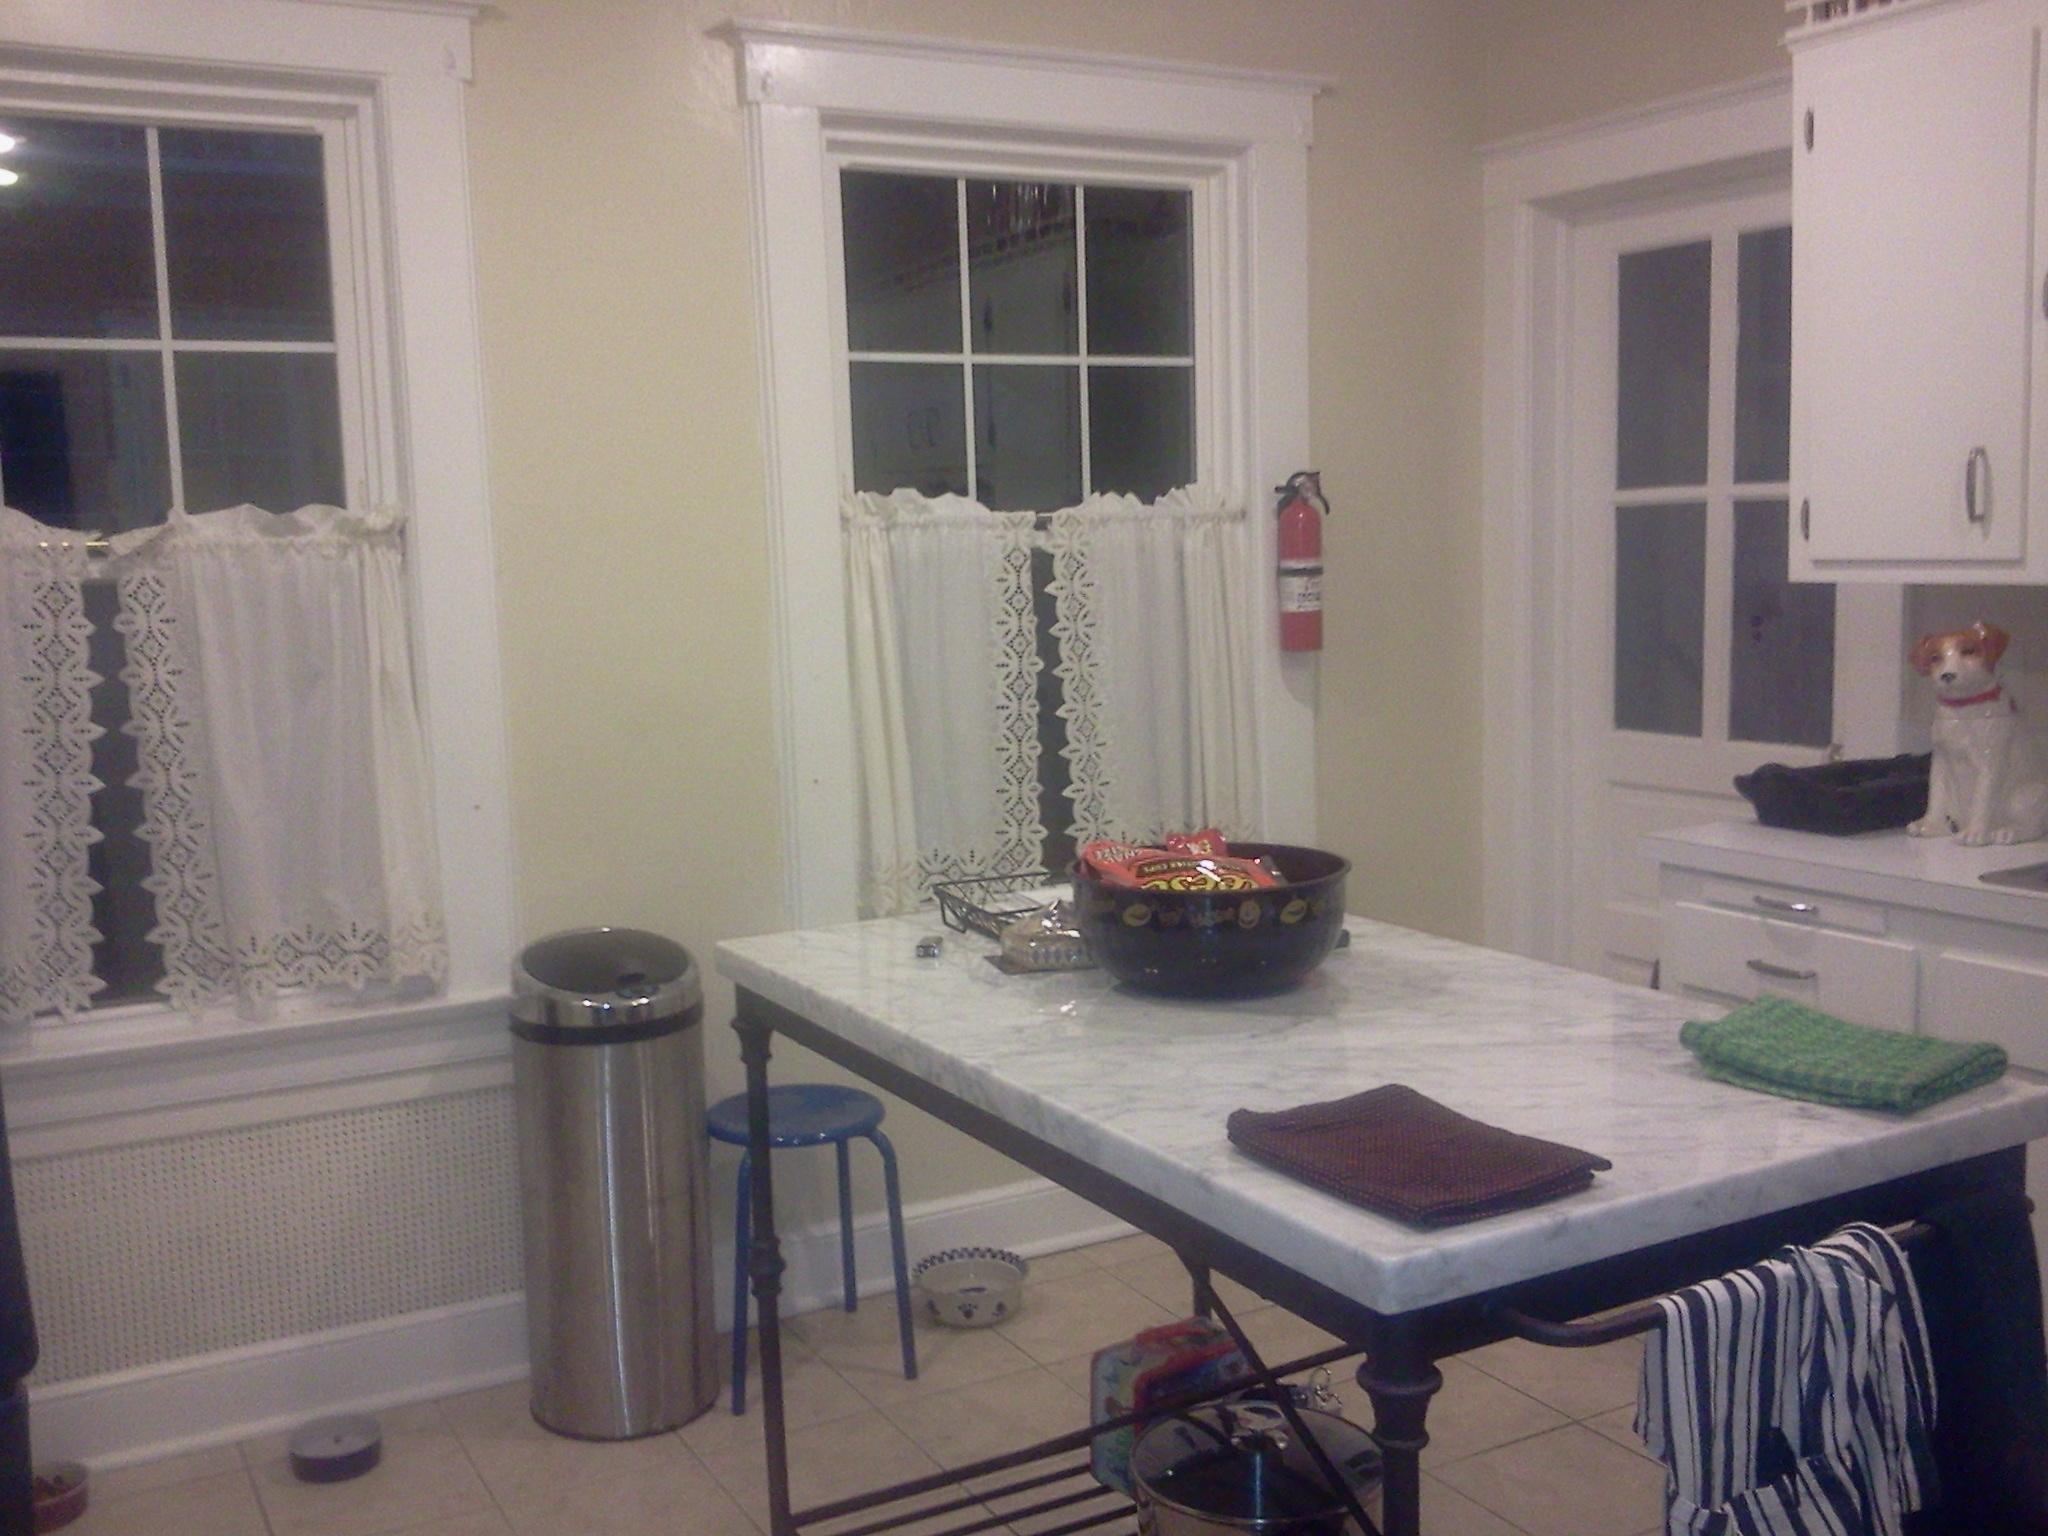 tutorial paint fau subway tile backsplash sawdust painting kitchen backsplashes pictures ideas hgtv kitchen